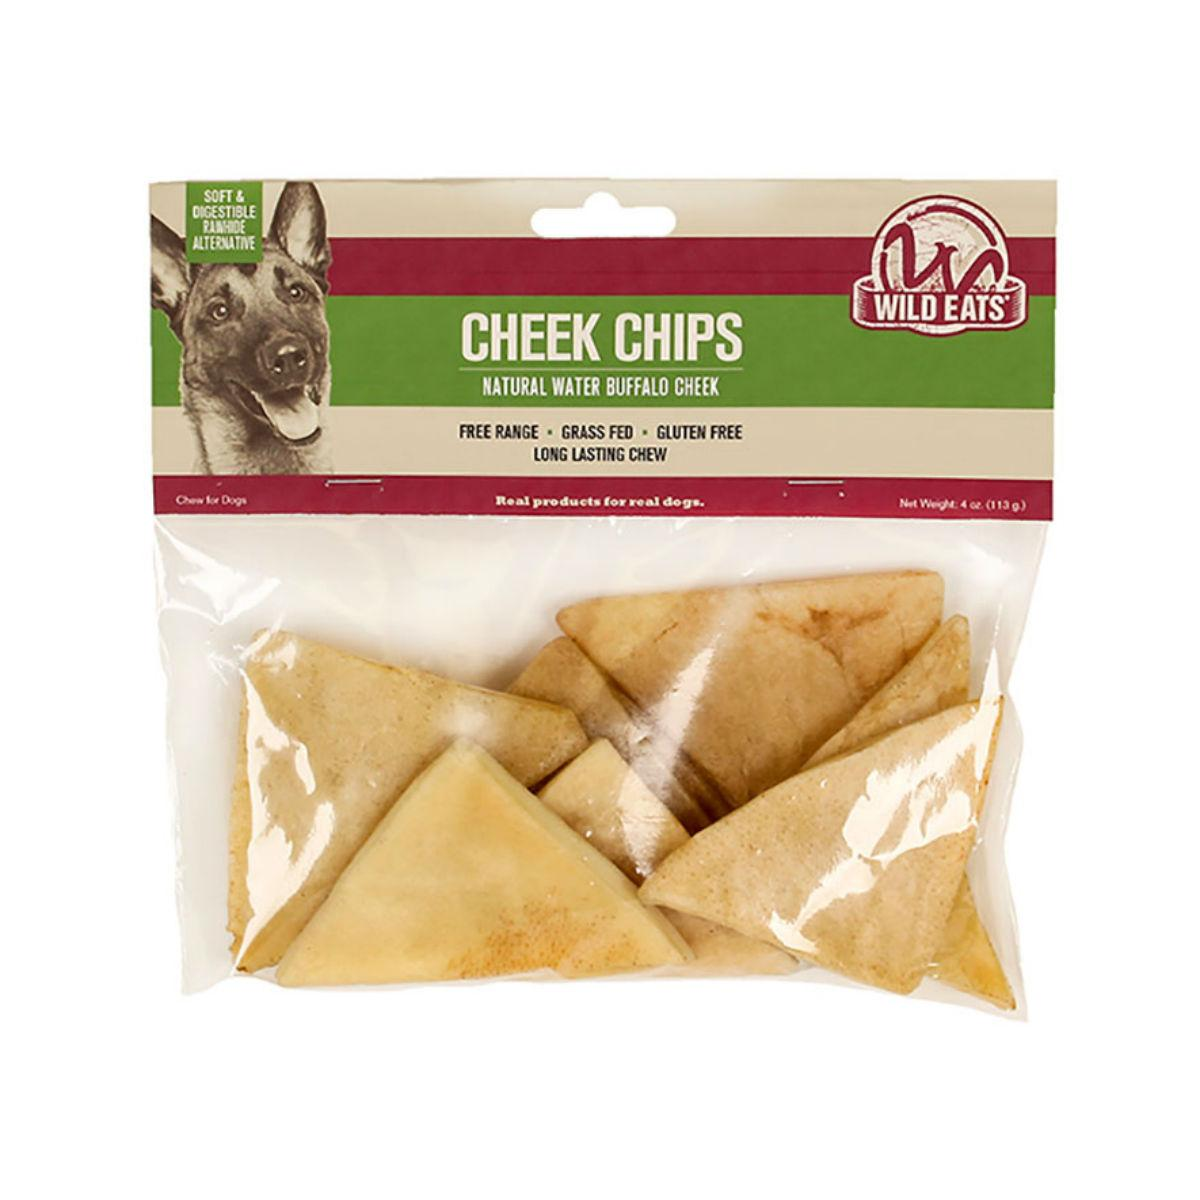 Wild Eats Cheek Chips Dog Chews